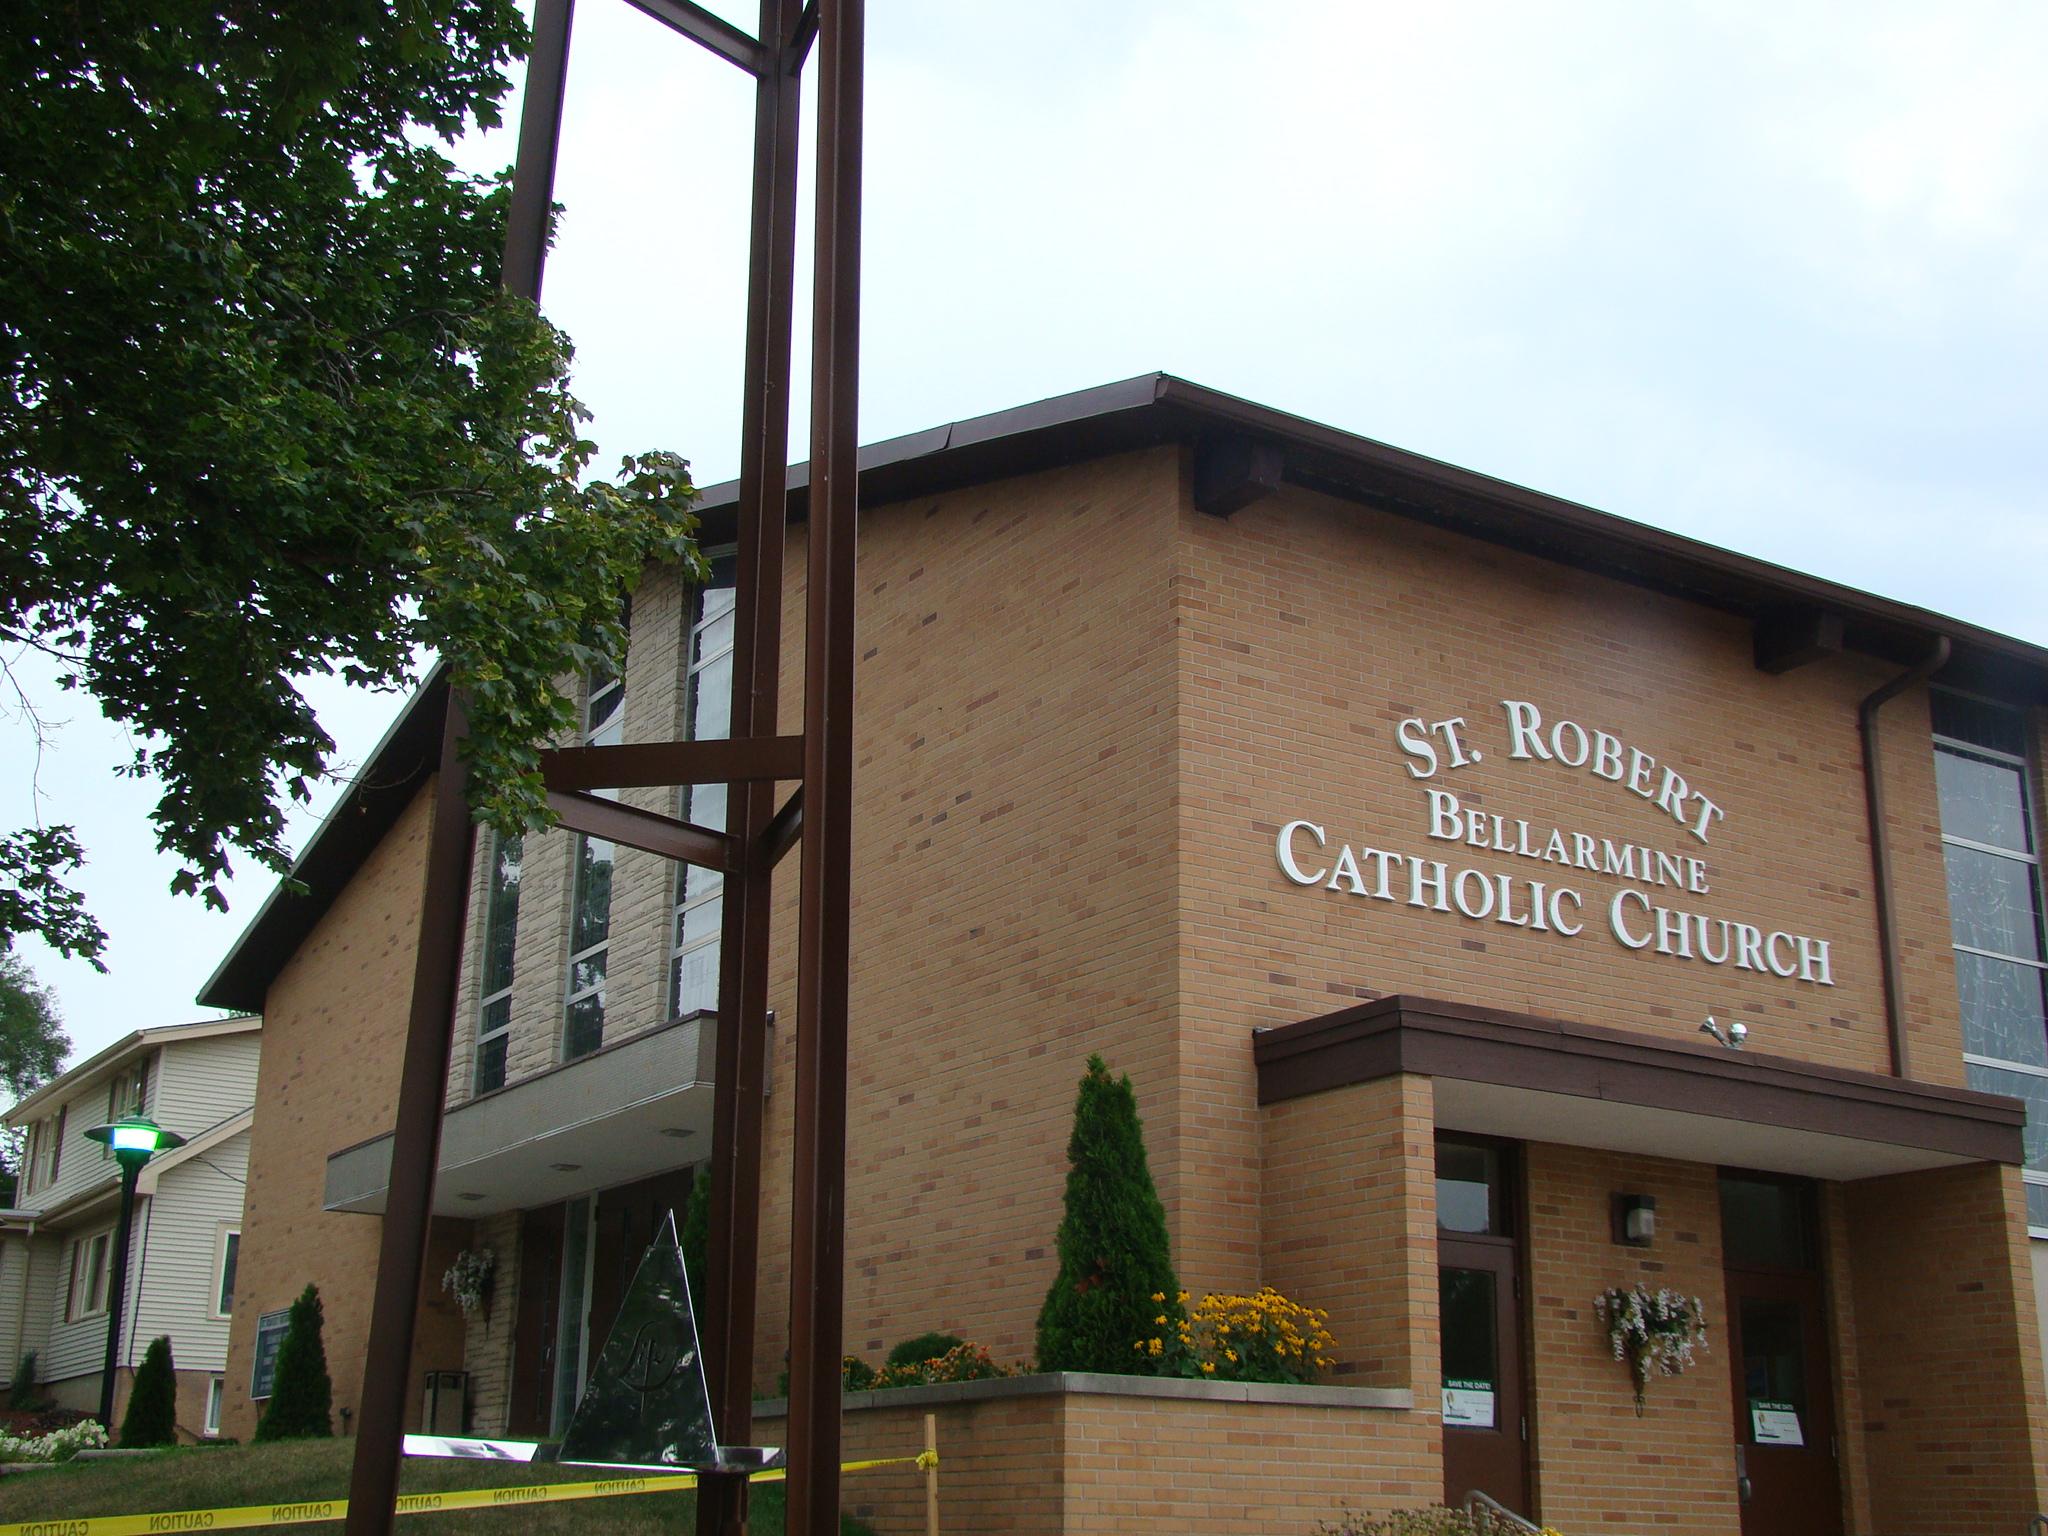 St. Robert Bellarmine Catholic Churc